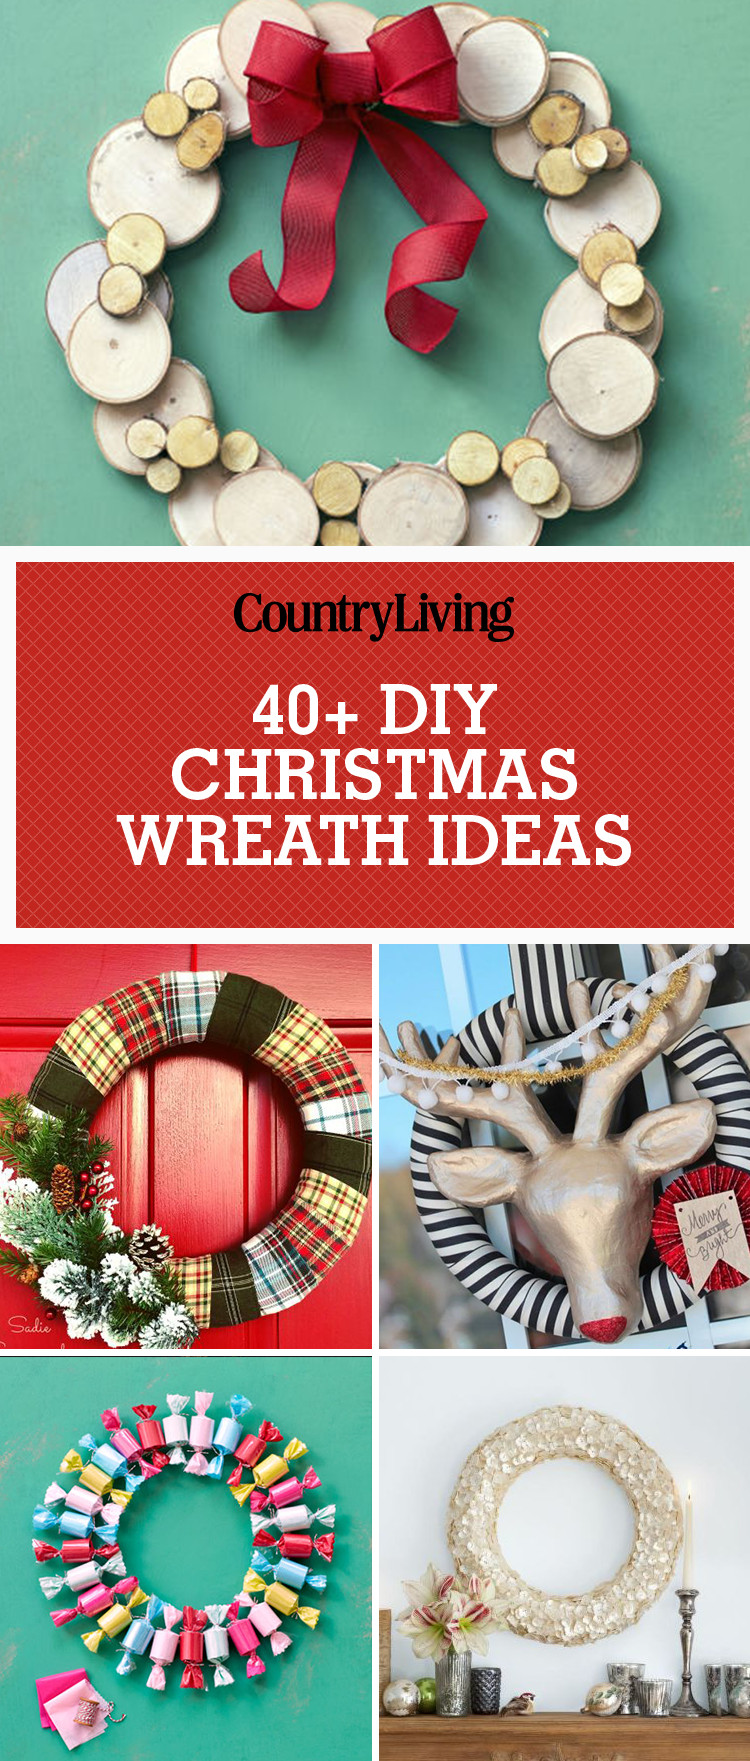 Christmas Decoration DIY Pinterest  40 DIY Christmas Wreath Ideas How To Make Holiday